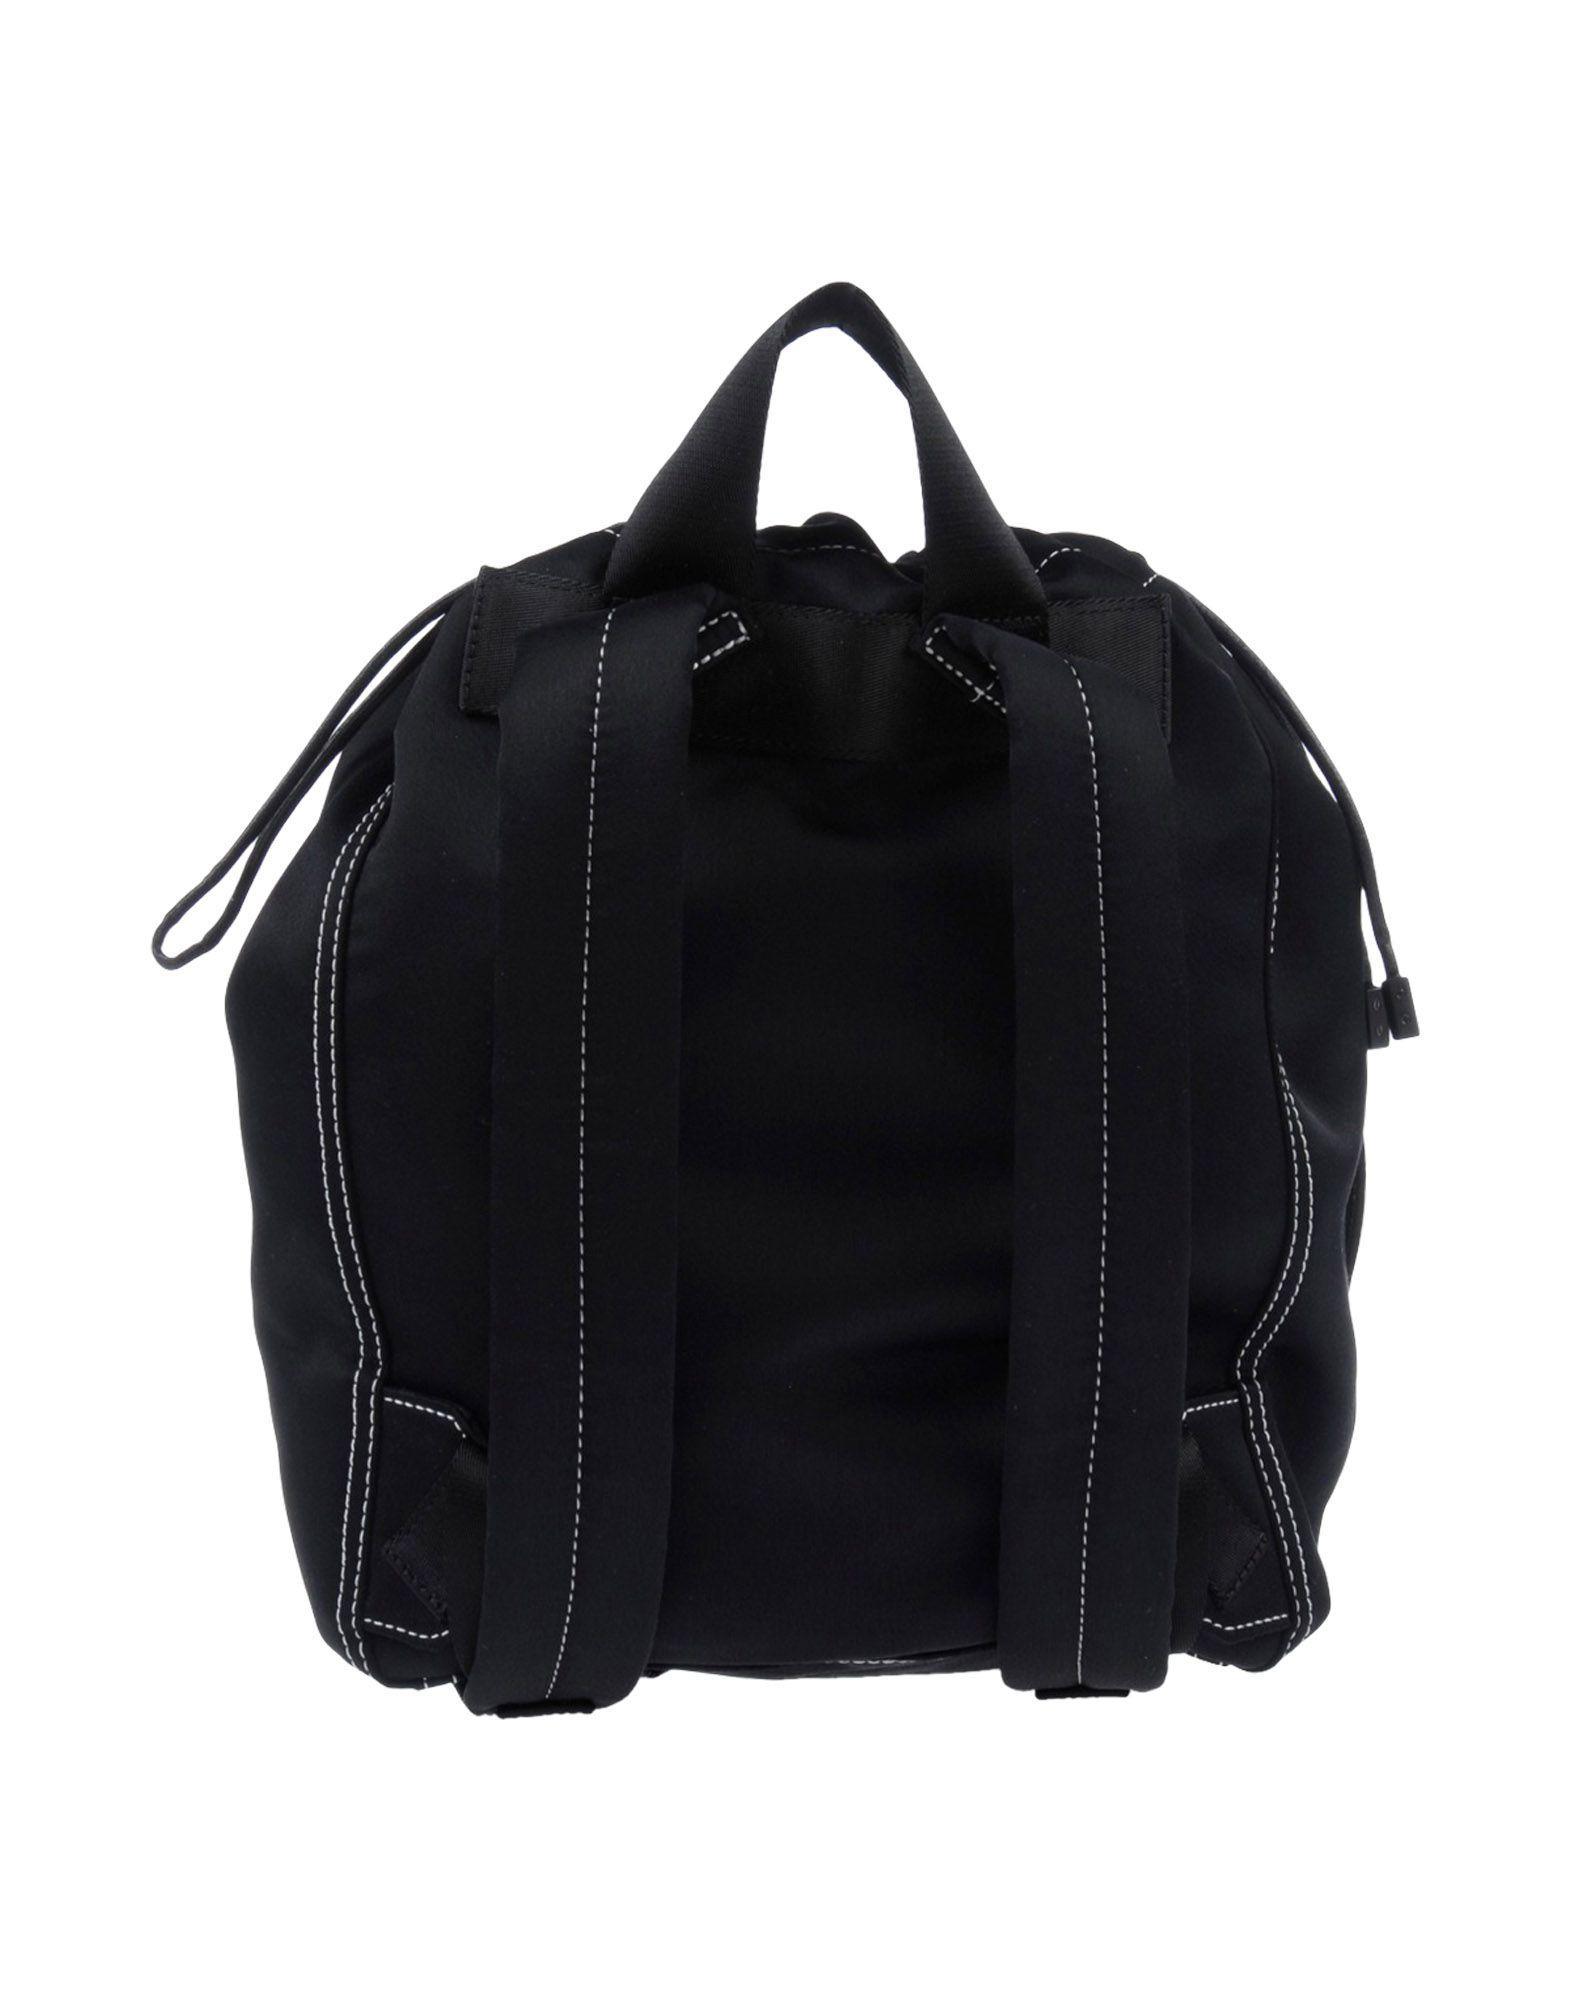 3.1 Phillip Lim Satin Backpacks & Fanny Packs in Black